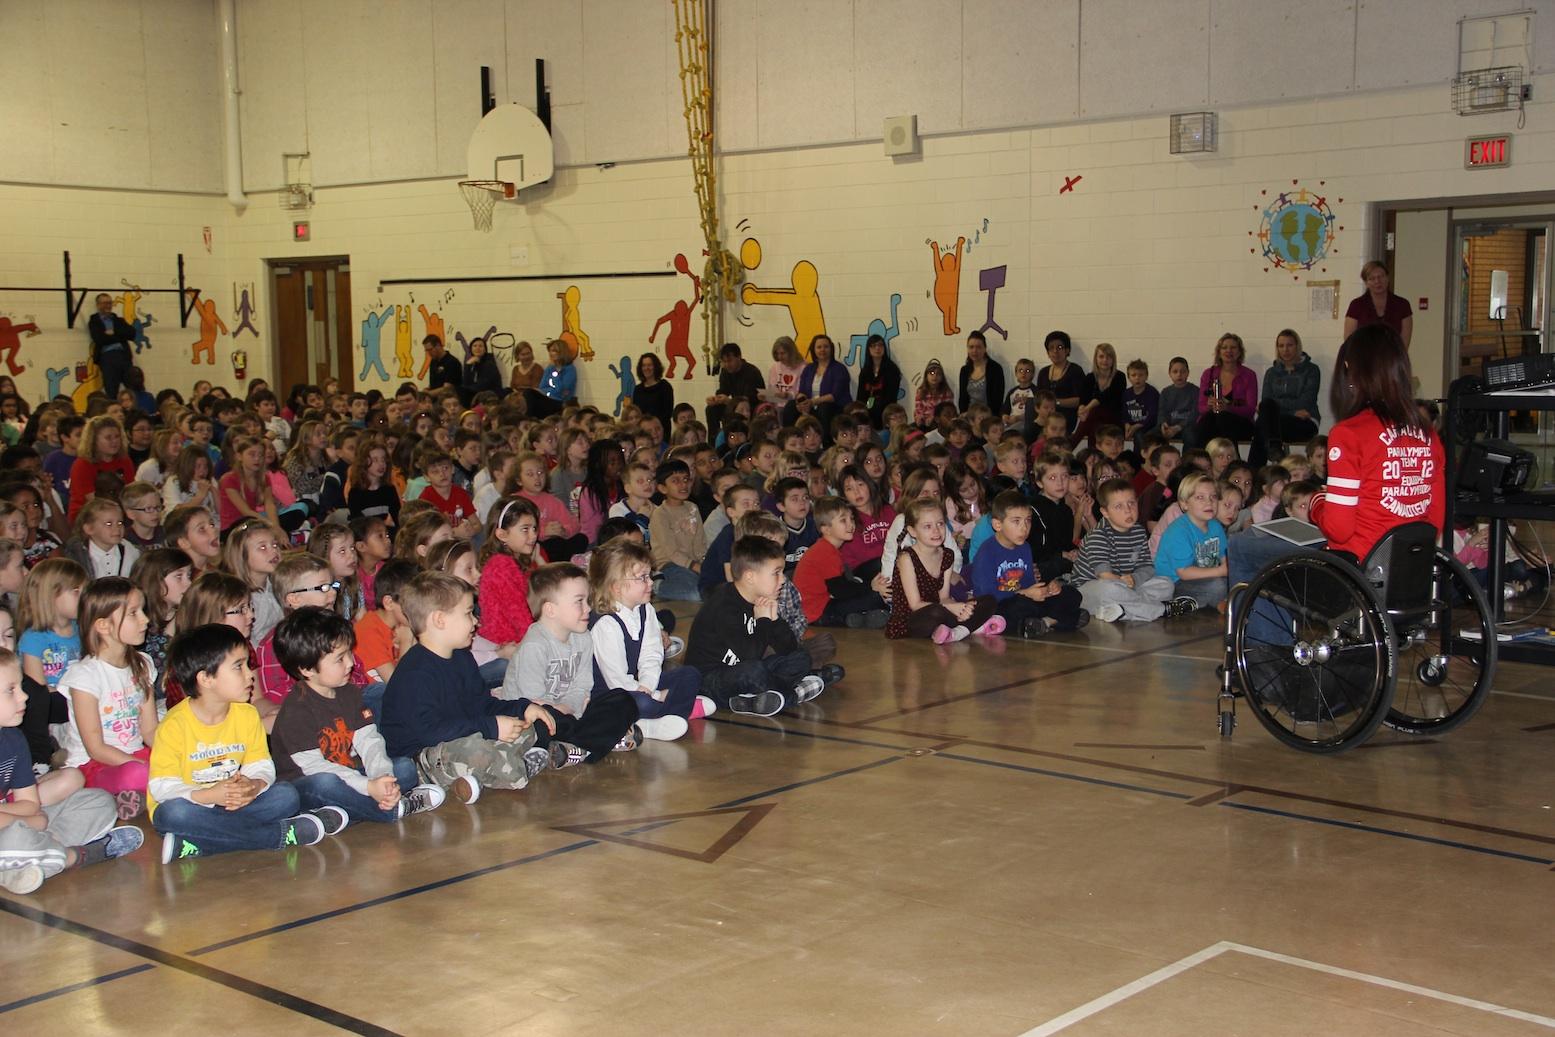 Springfield Heights Elementary School 2013